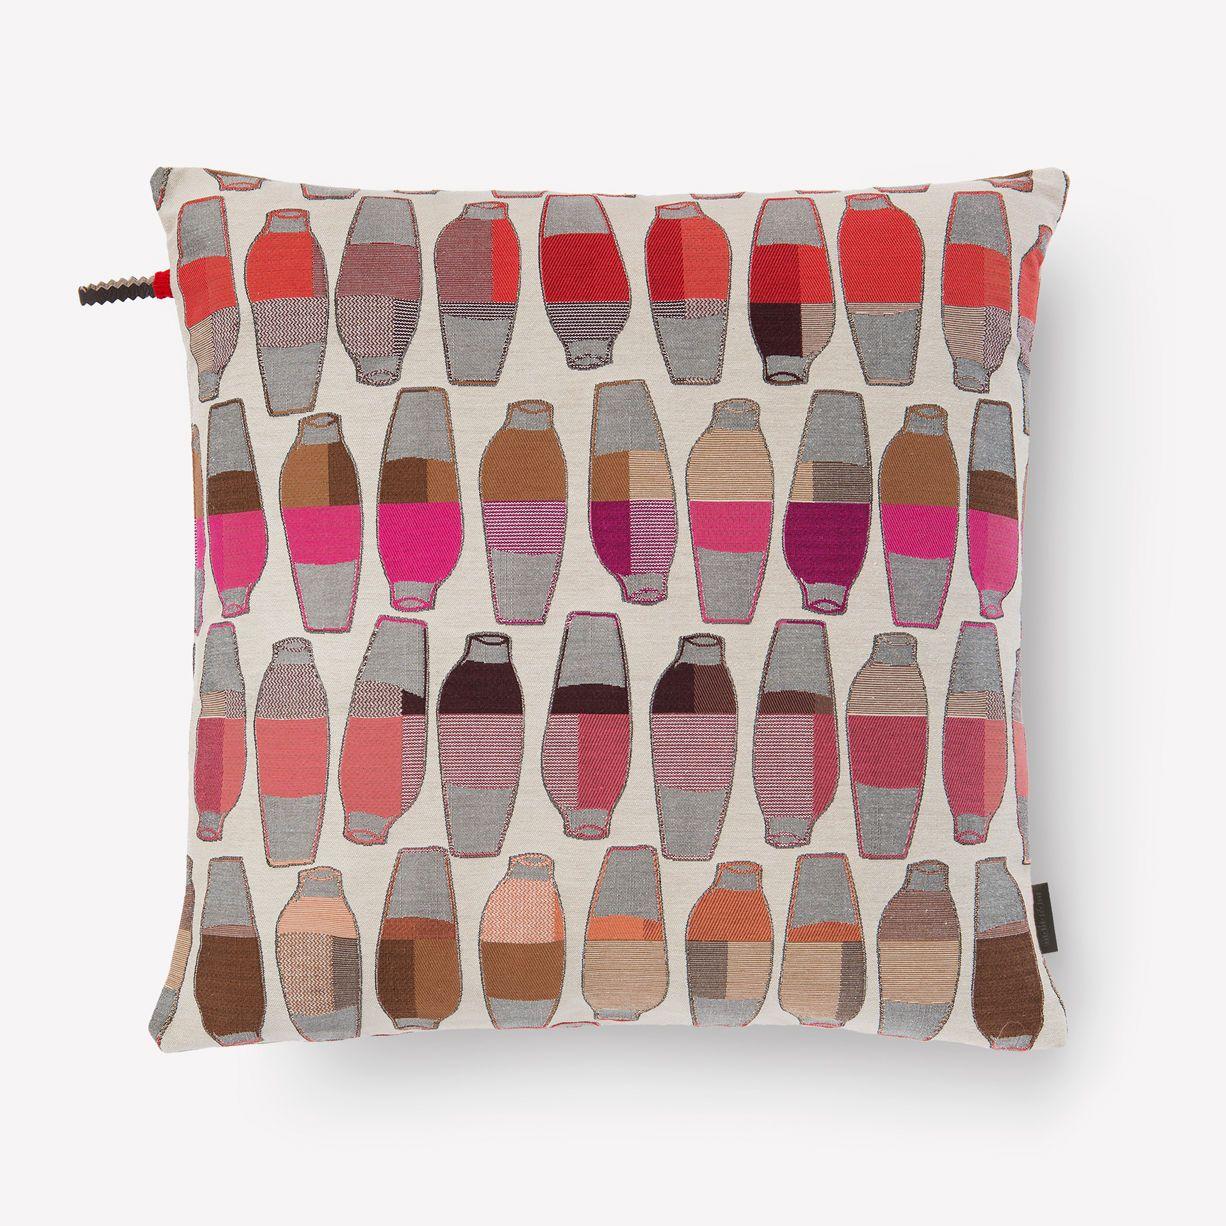 Maharam - Vases Pillow by Hella Jongerius